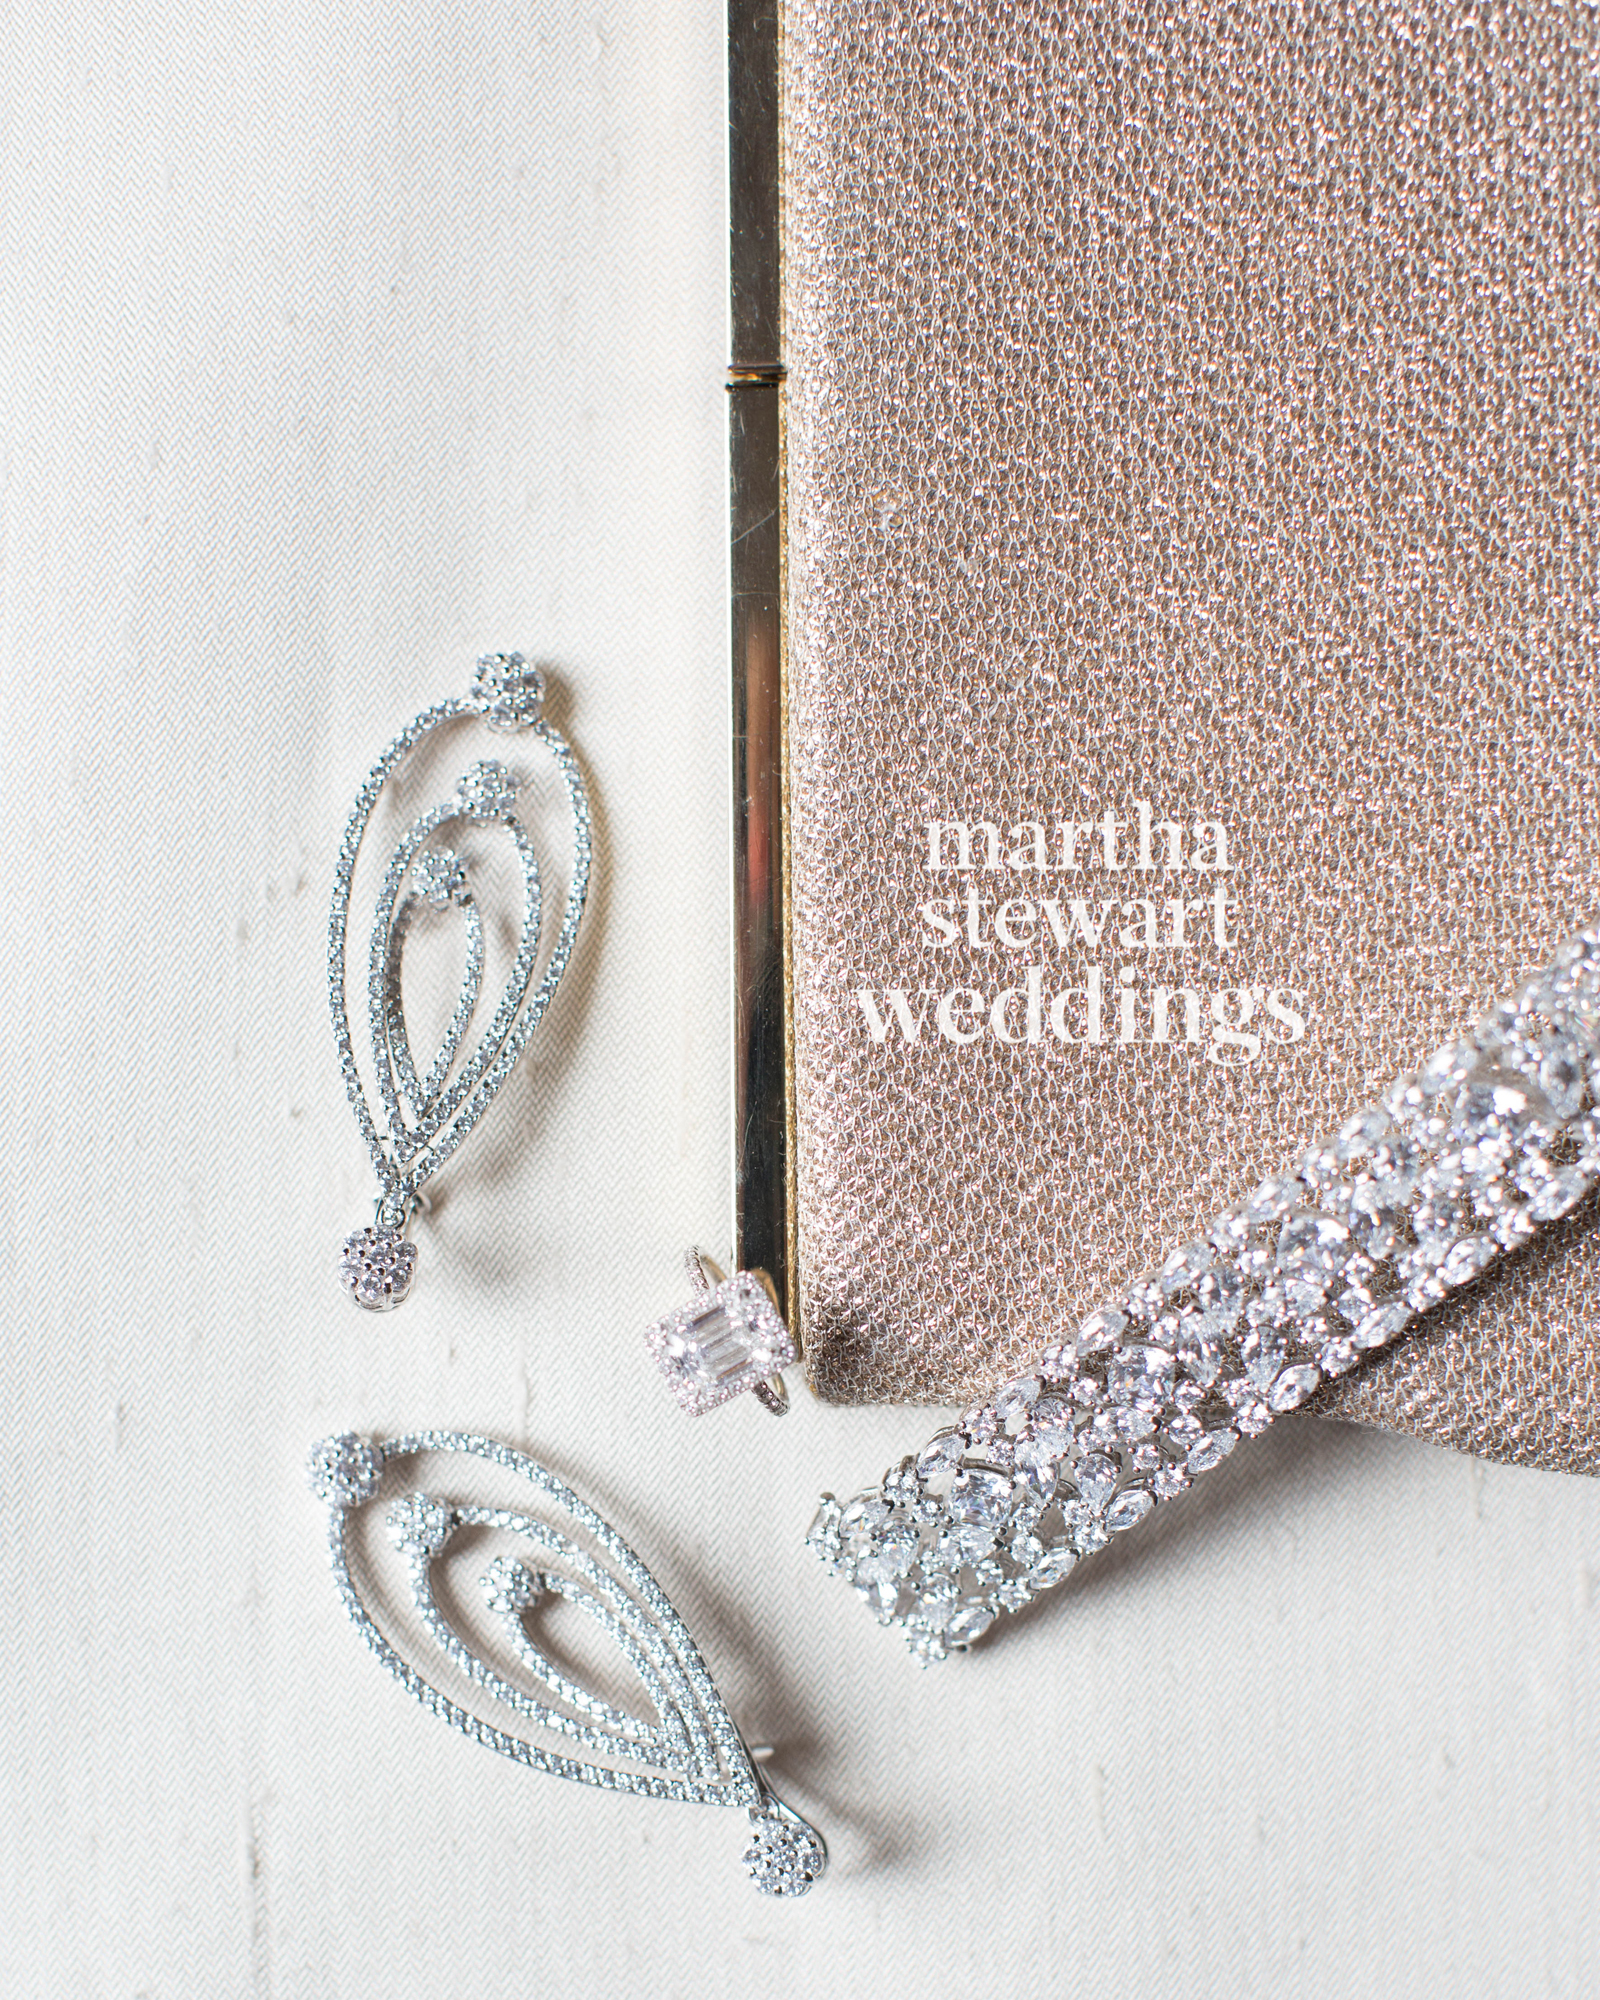 jenny-freddie-wedding-france-111-d112242-watermarked-1215.jpg